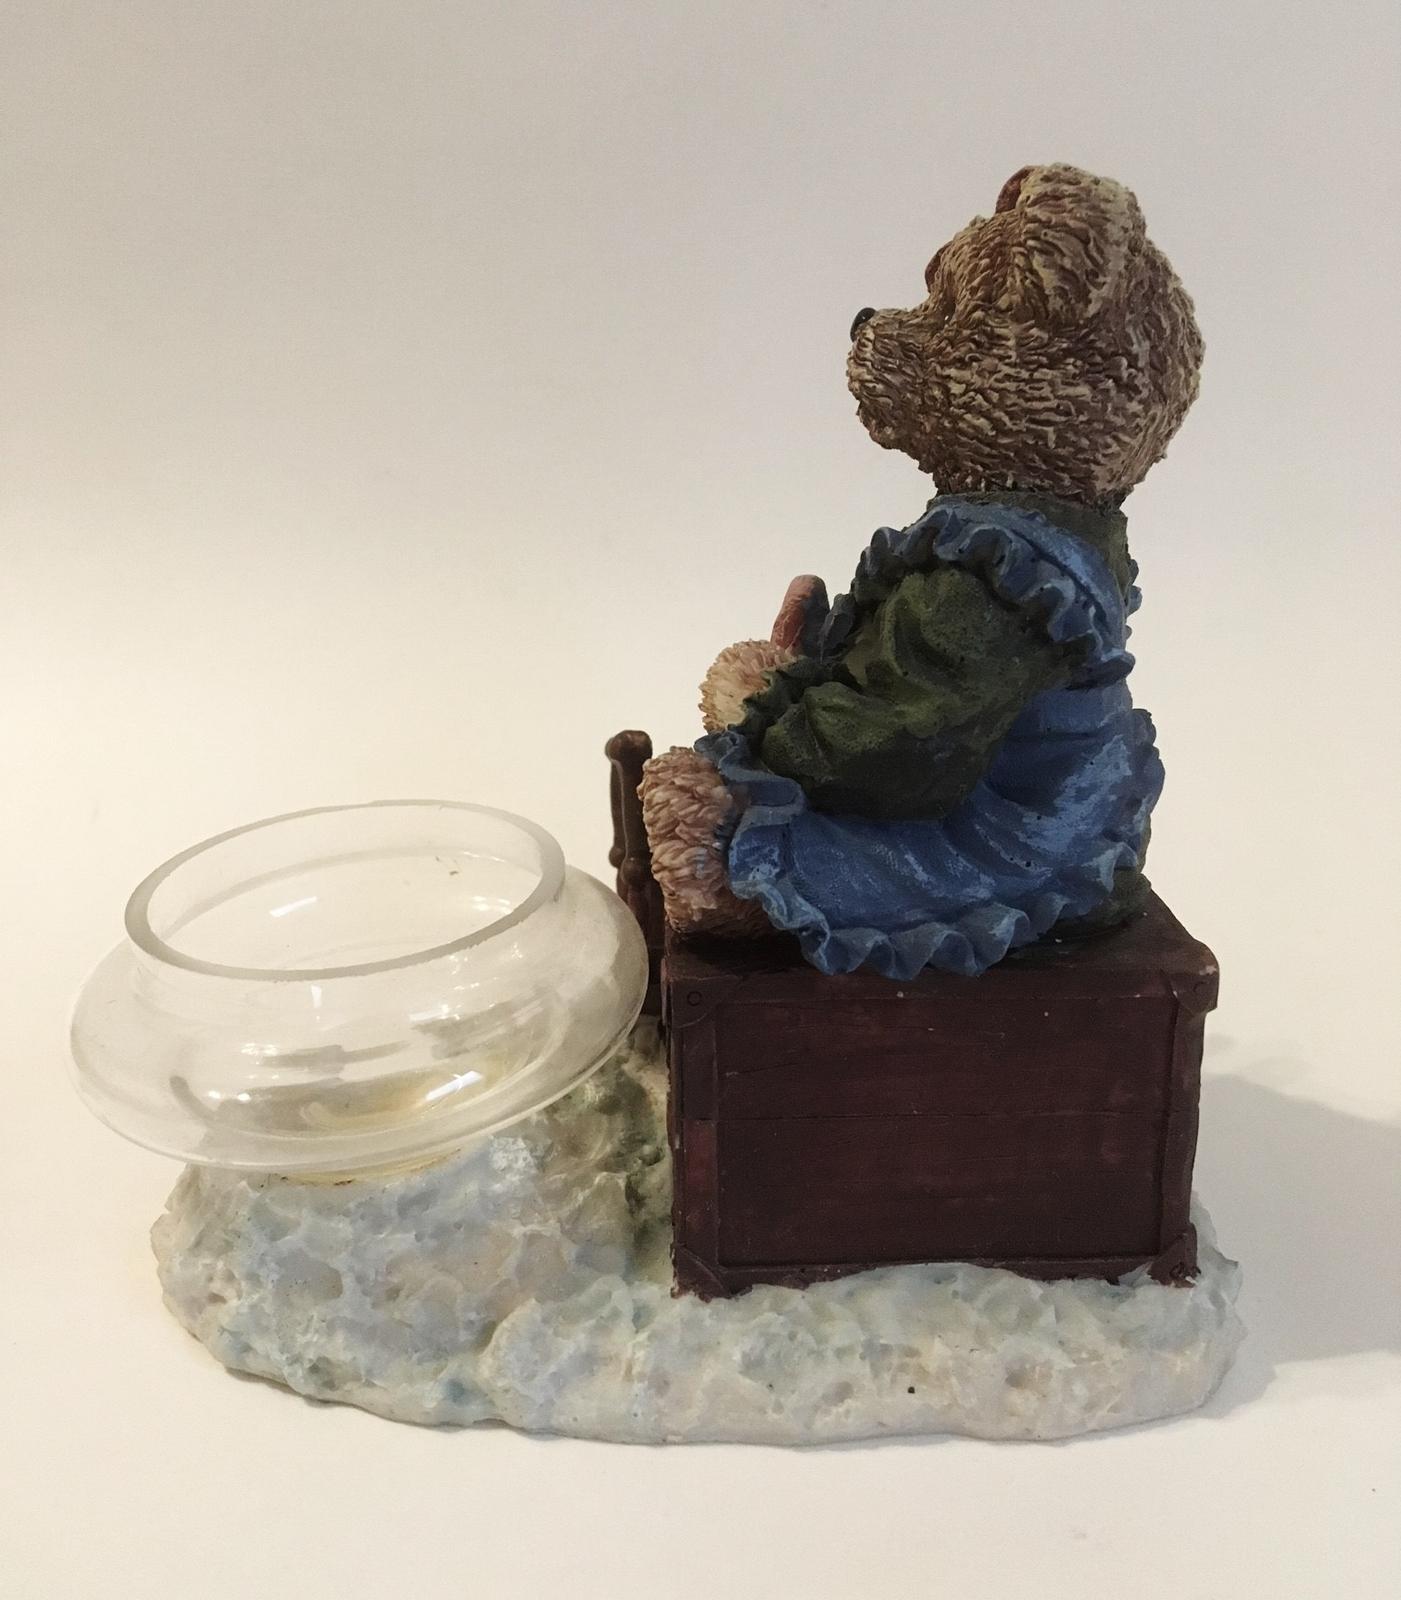 Mama & Baby Teddy Bear Tea Light Candle Holder Blue Green Brown Home Decor Cute